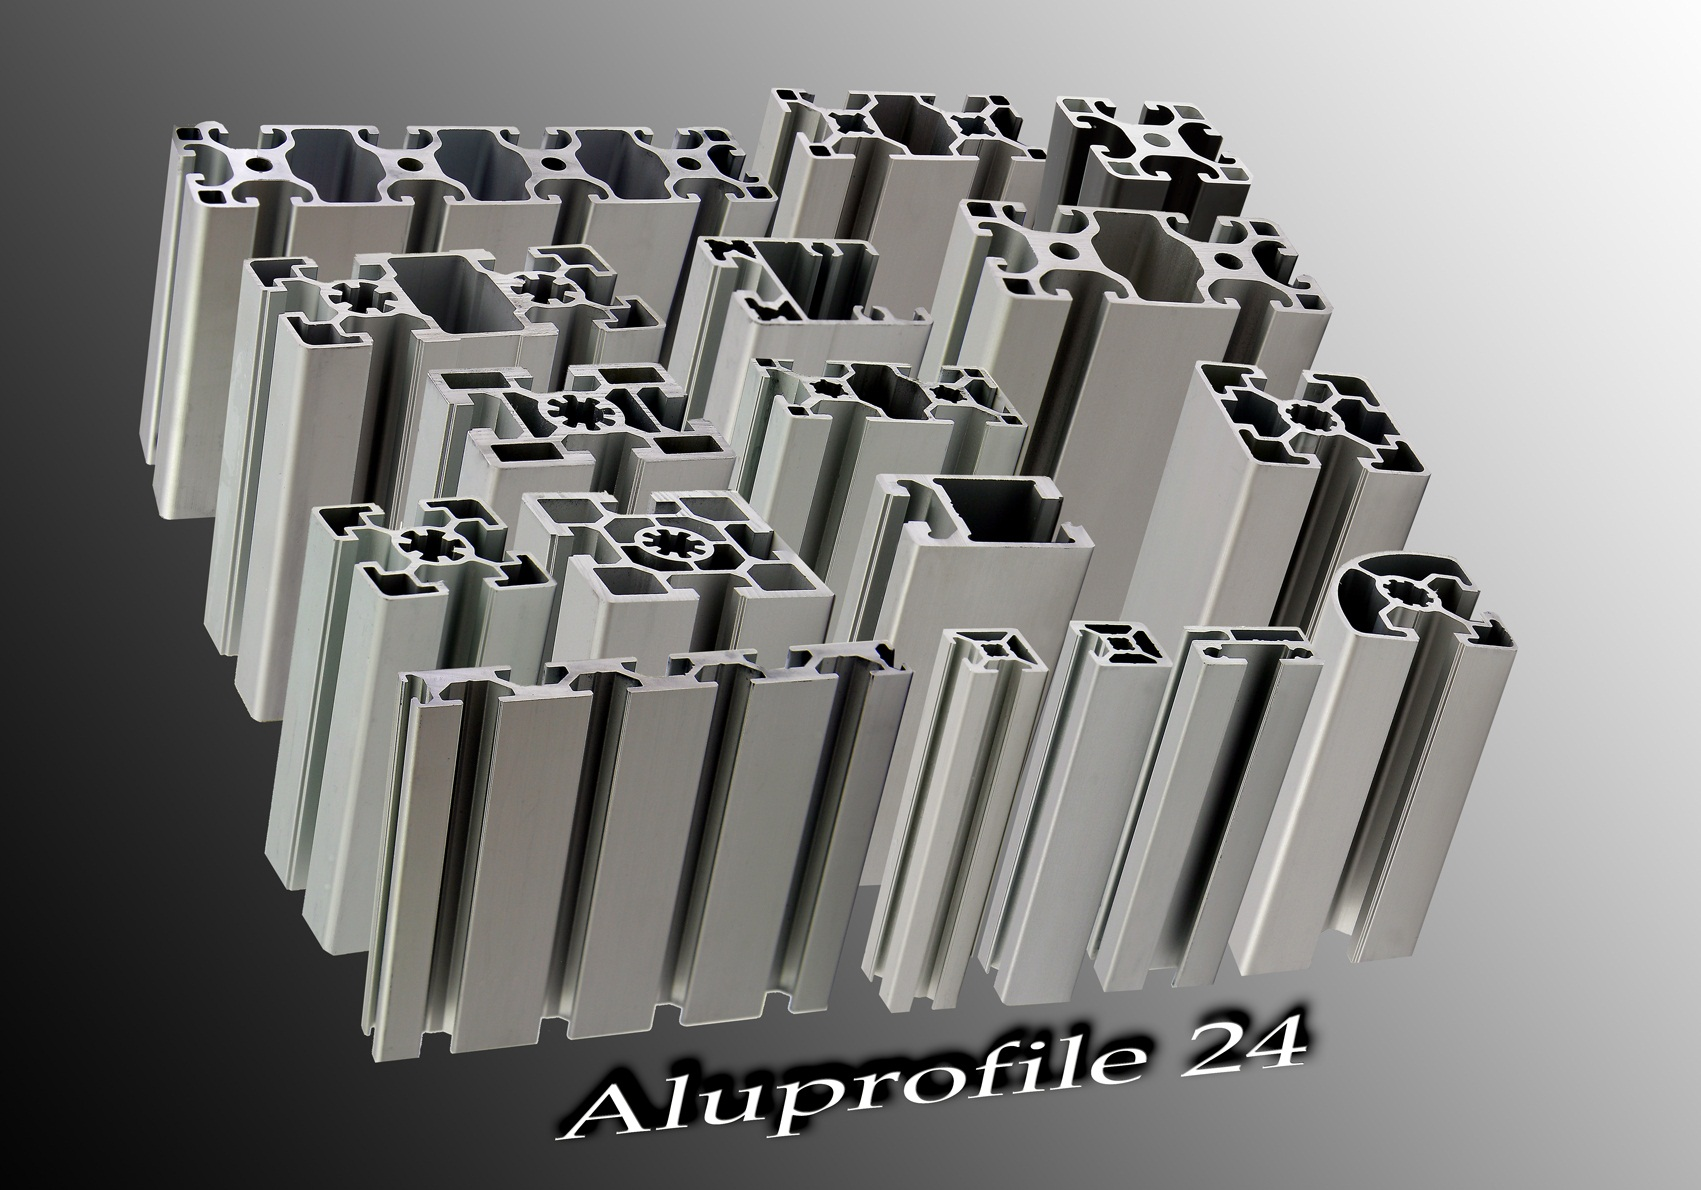 aluprofile 24 aluprofile aluminiumprofile strebenprofile maschinenbauprofile profile. Black Bedroom Furniture Sets. Home Design Ideas